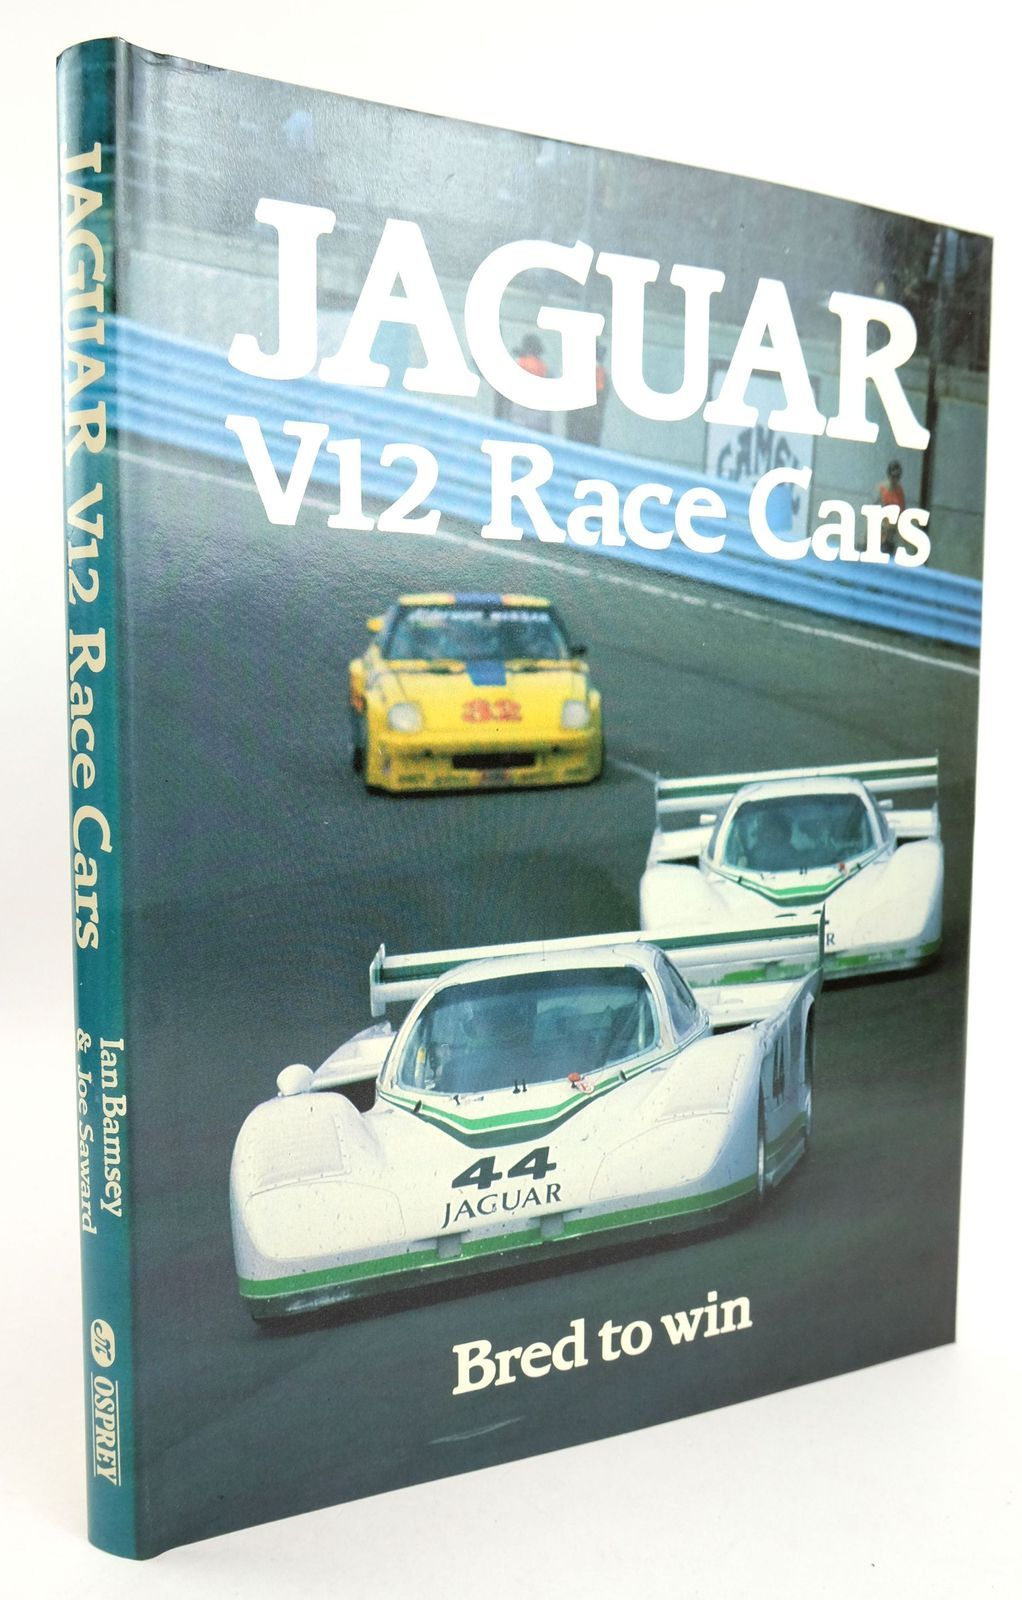 Photo of JAGUAR V12 RACE CARS written by Bamsey, Ian Saward, Joe published by Osprey Publishing (STOCK CODE: 1819132)  for sale by Stella & Rose's Books